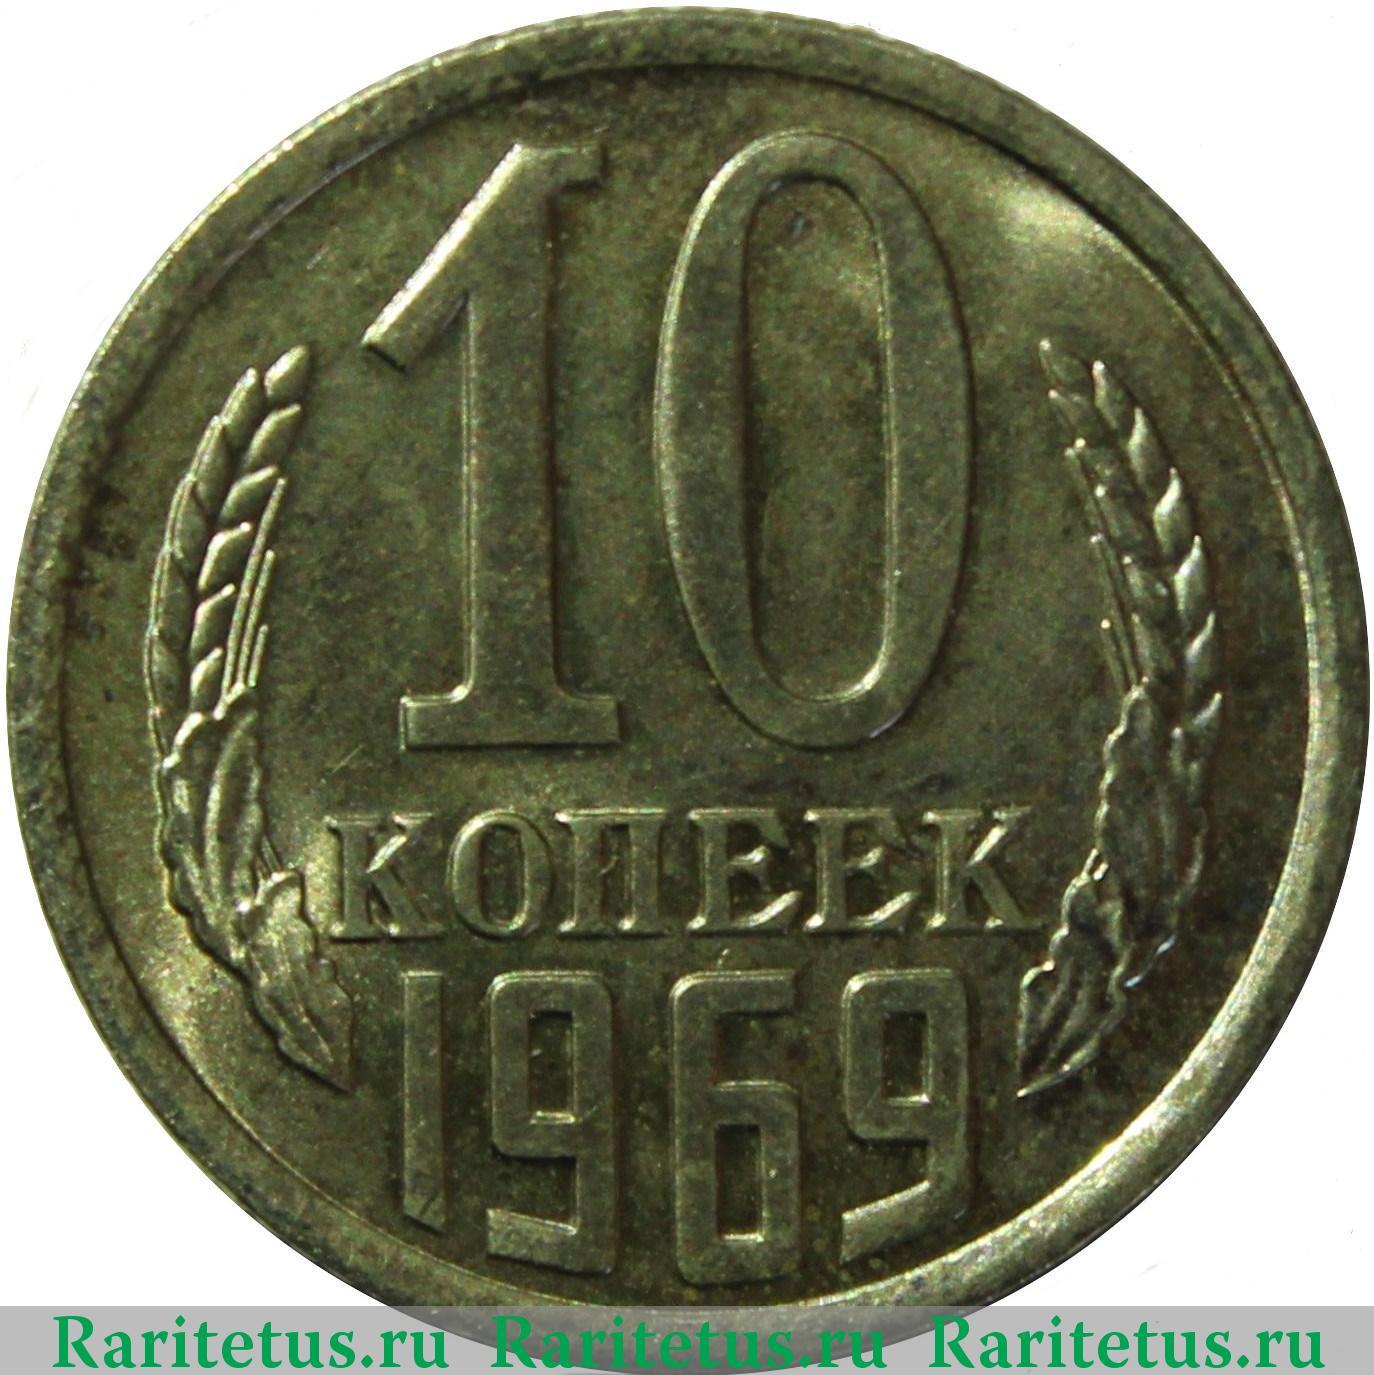 10 коп 1969 года цена монеты палестины каталог